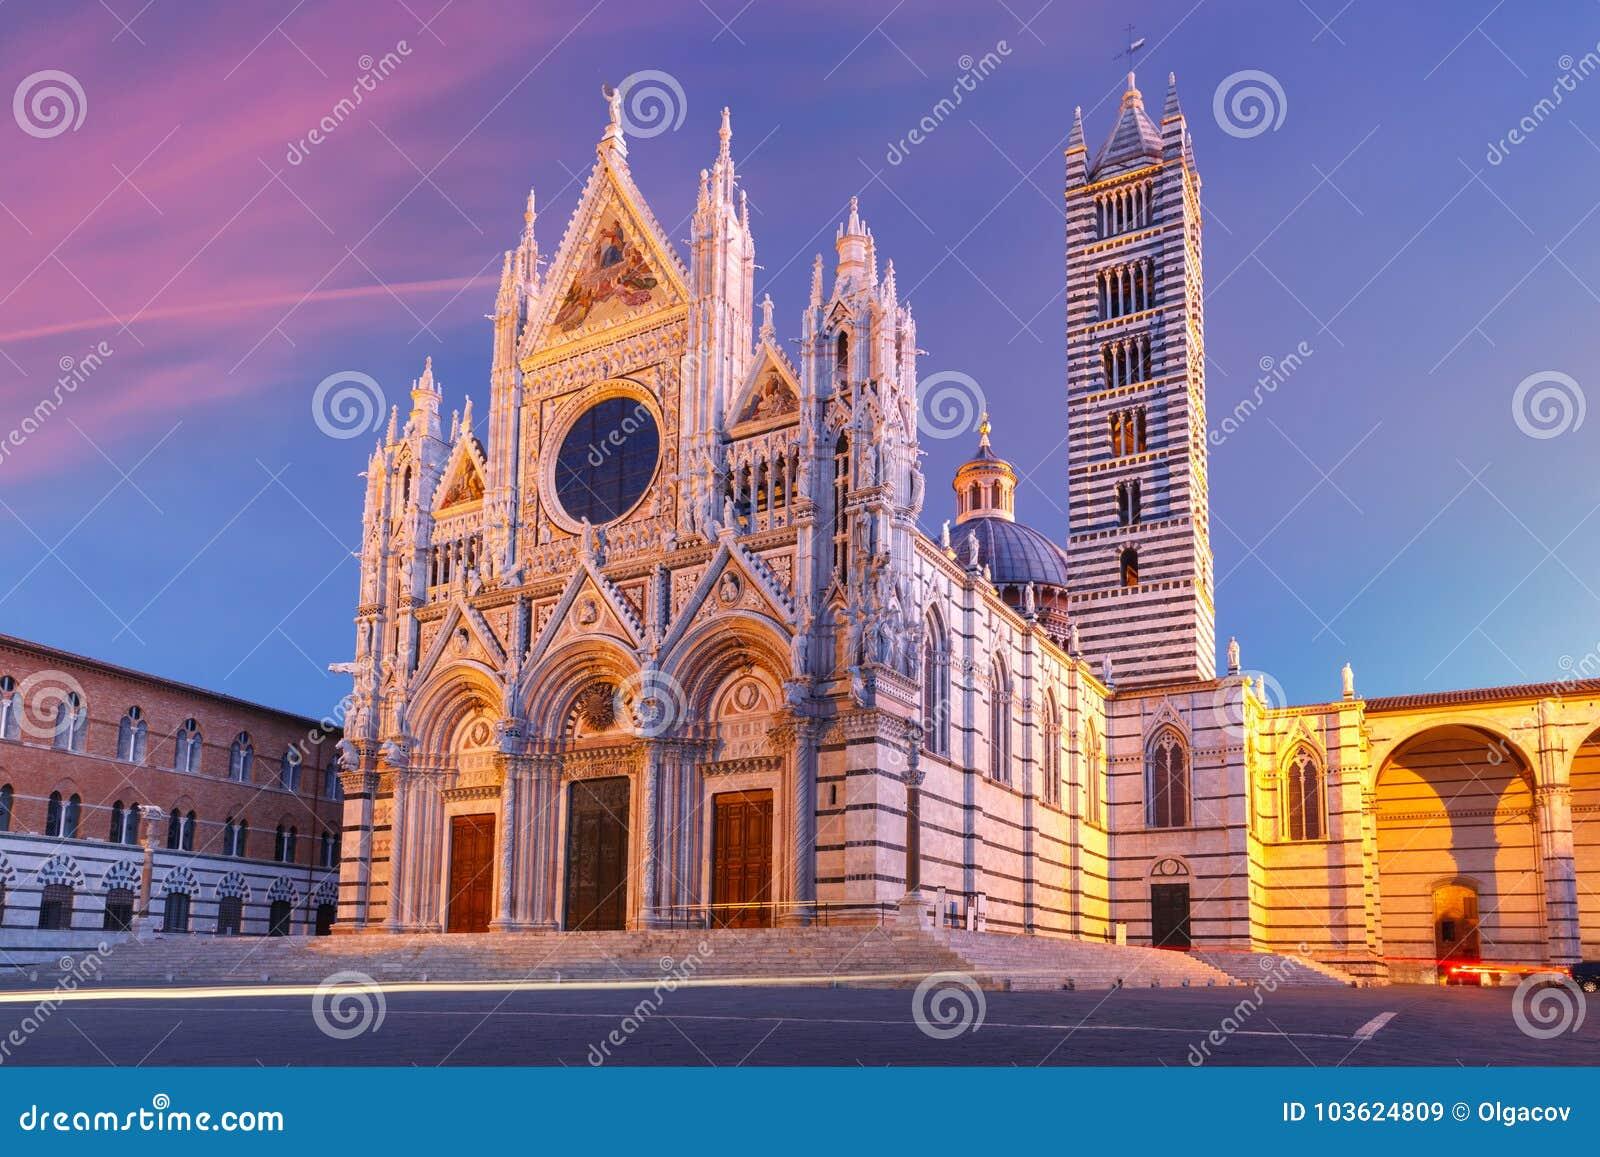 Siena Cathedral At Sunrise, Tuscany, Italy Stock Image ...